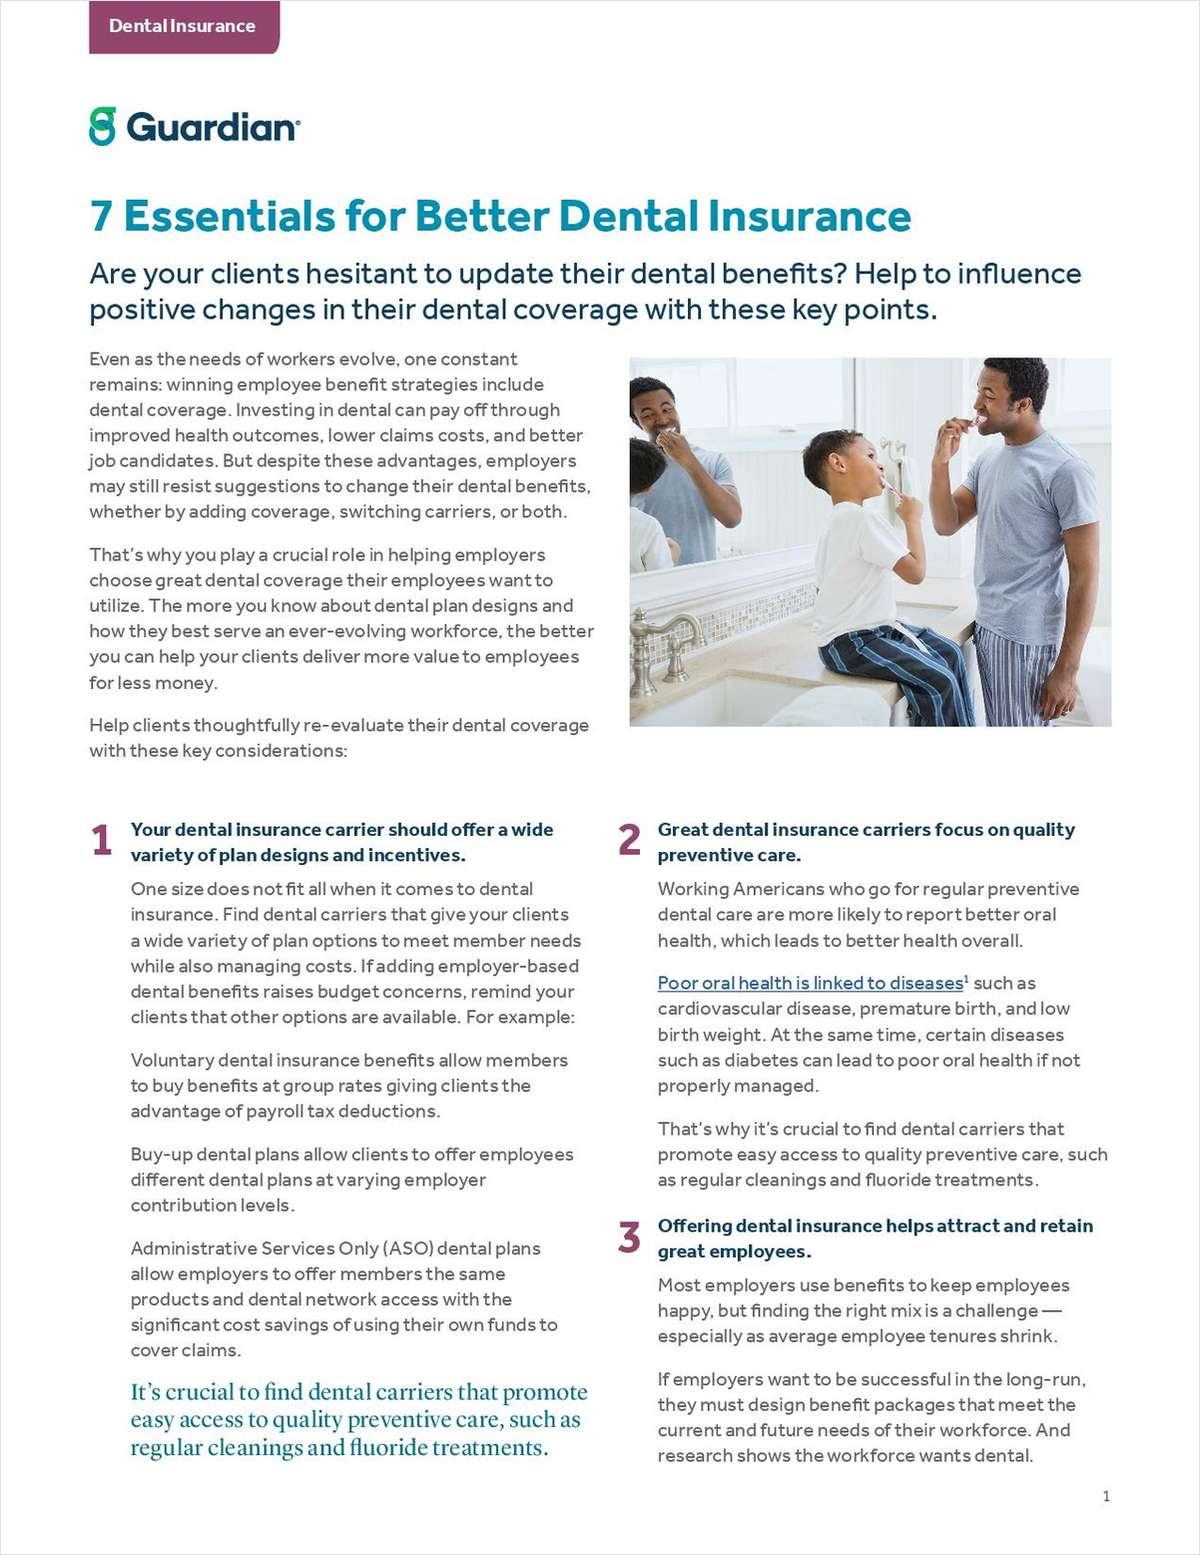 7 Essentials for Better Dental Insurance